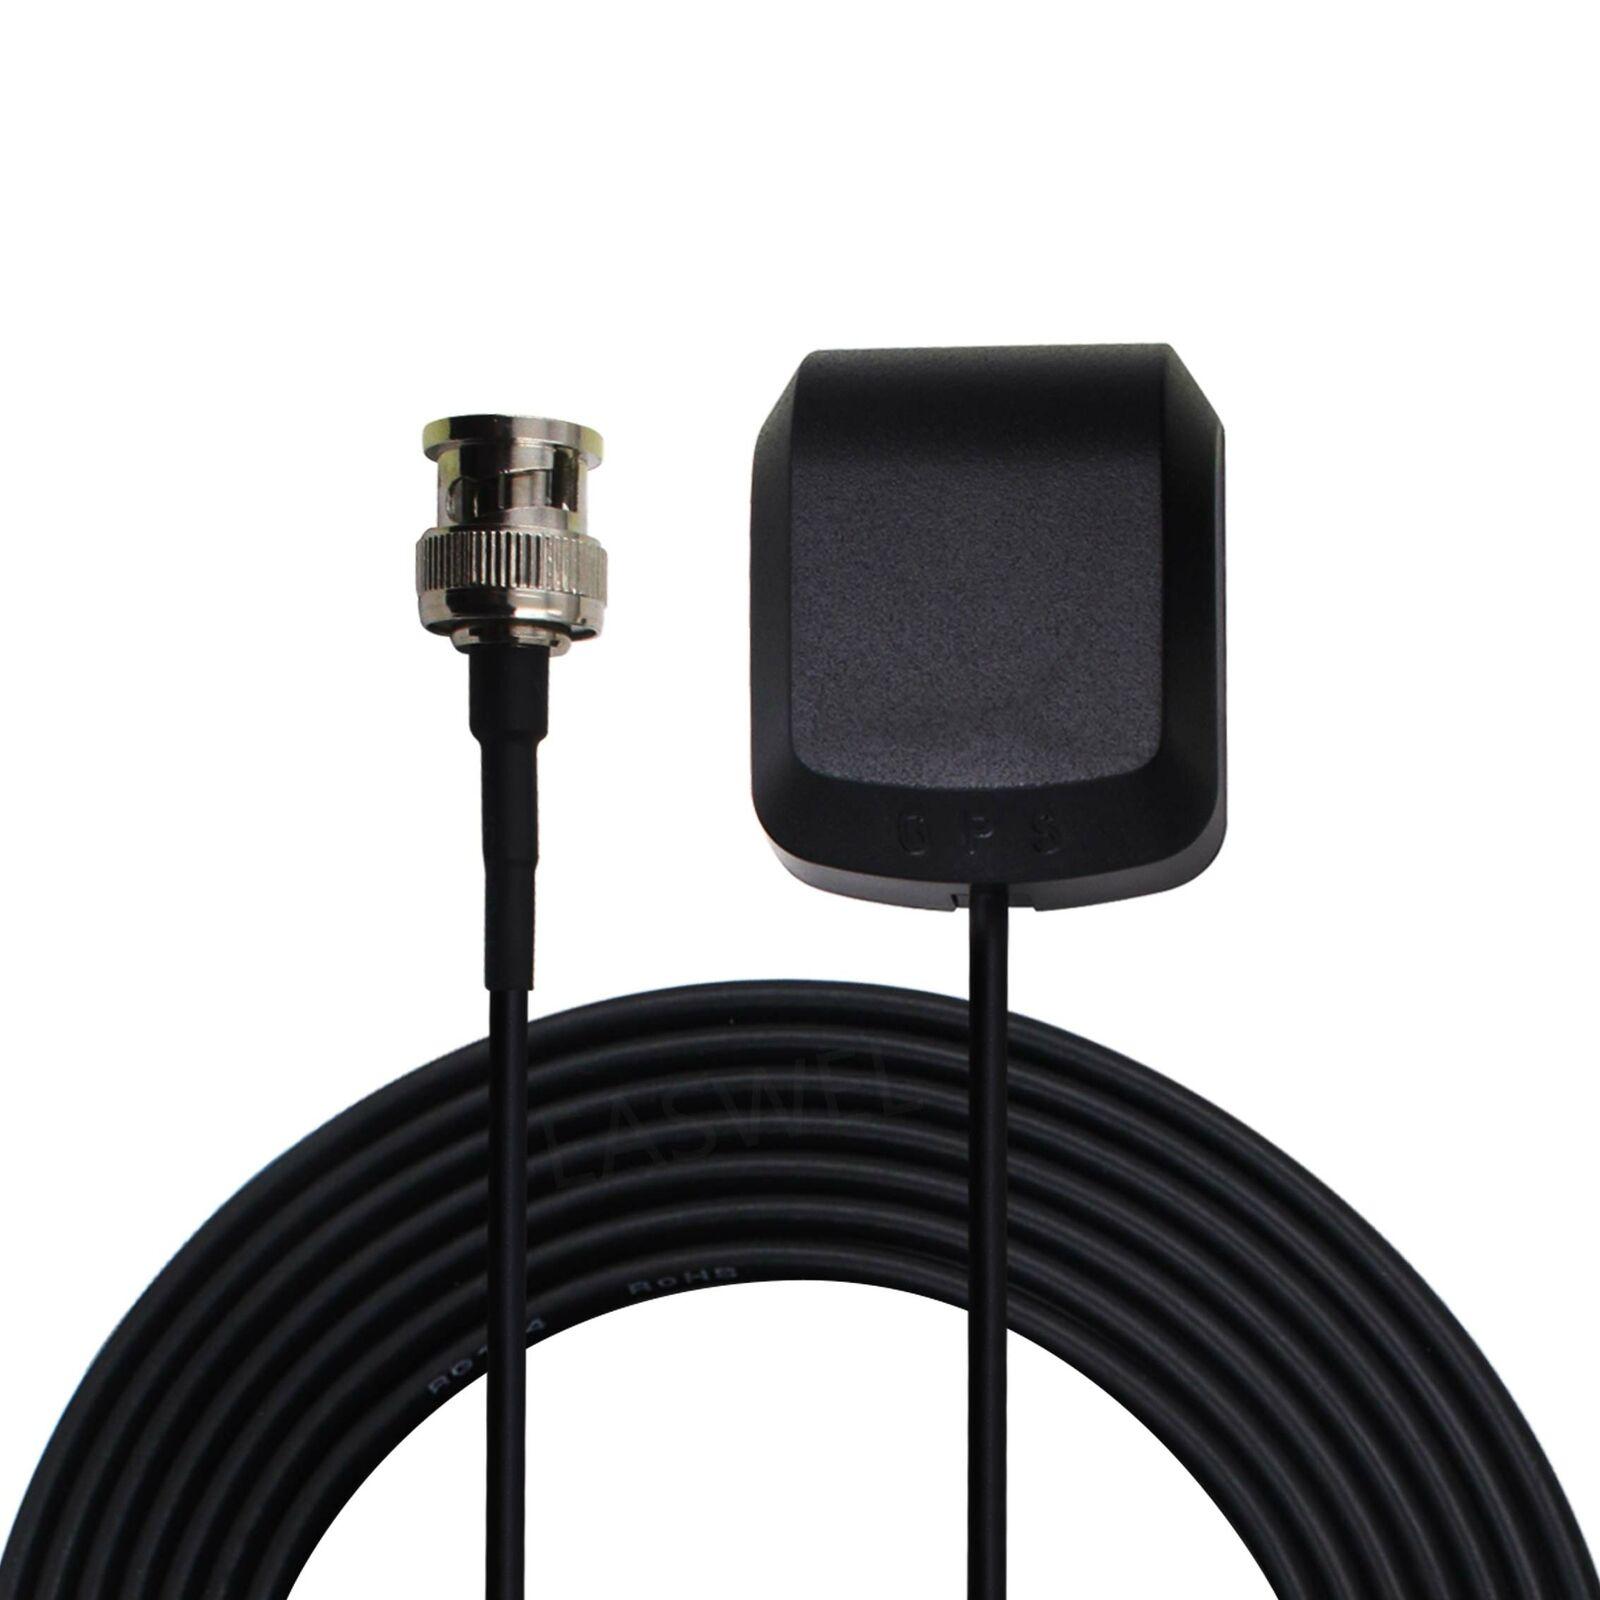 GPS Antenna BNC For Garmin StreetPilot III,3 276 Pilot